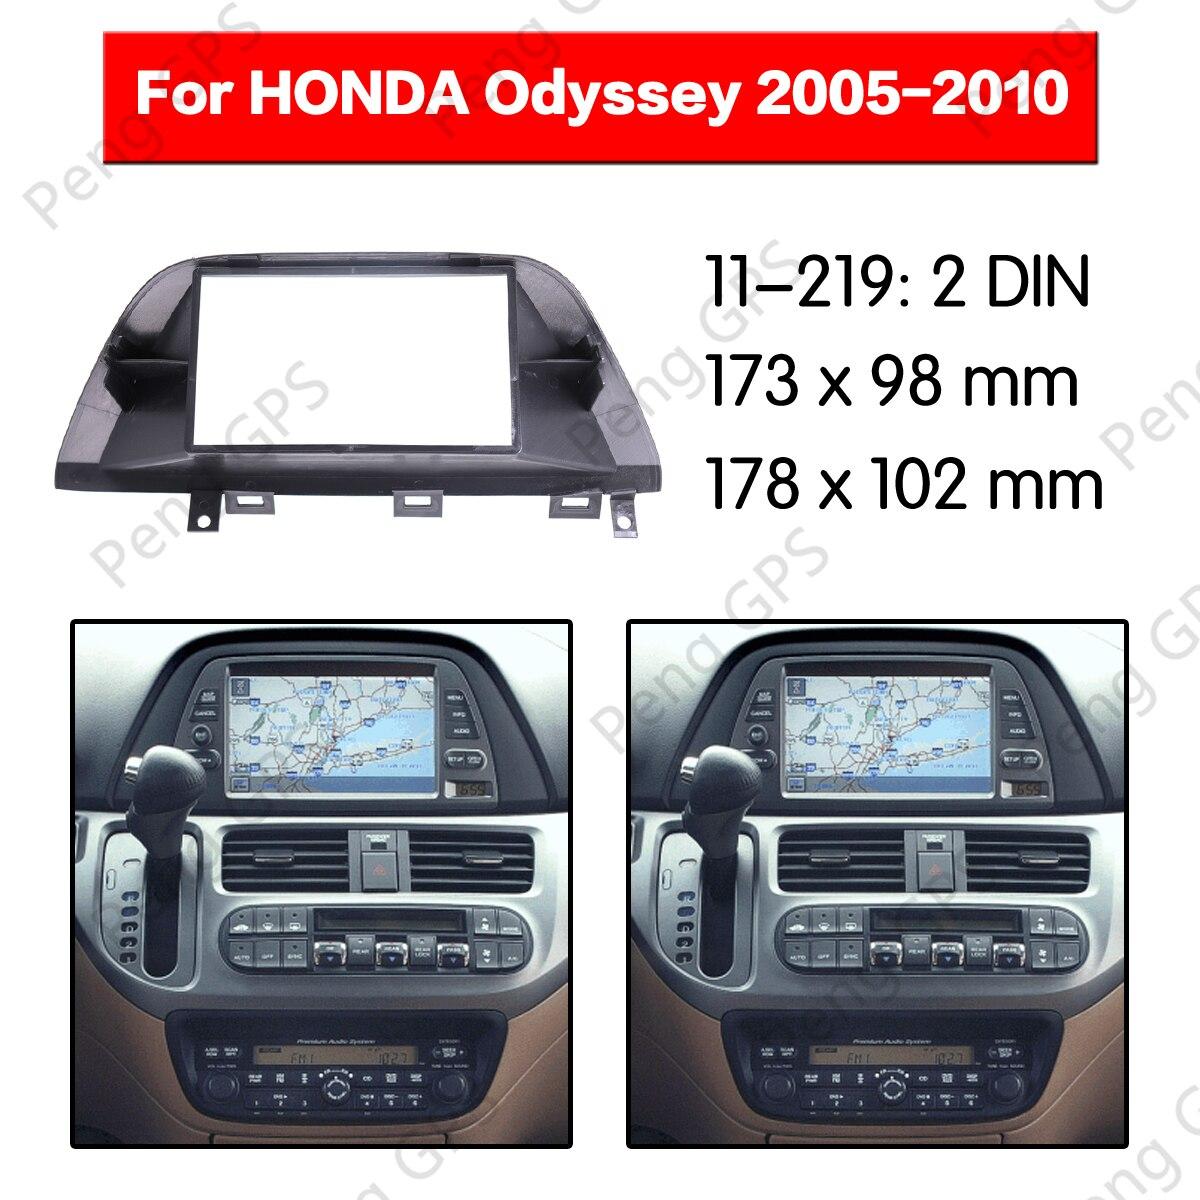 2 Din Car Radio stereo Fitting installation fascia For HONDA Odyssey 2005-2010 Stereo Frame Fascias Mount Panel DVD CD trim ABS